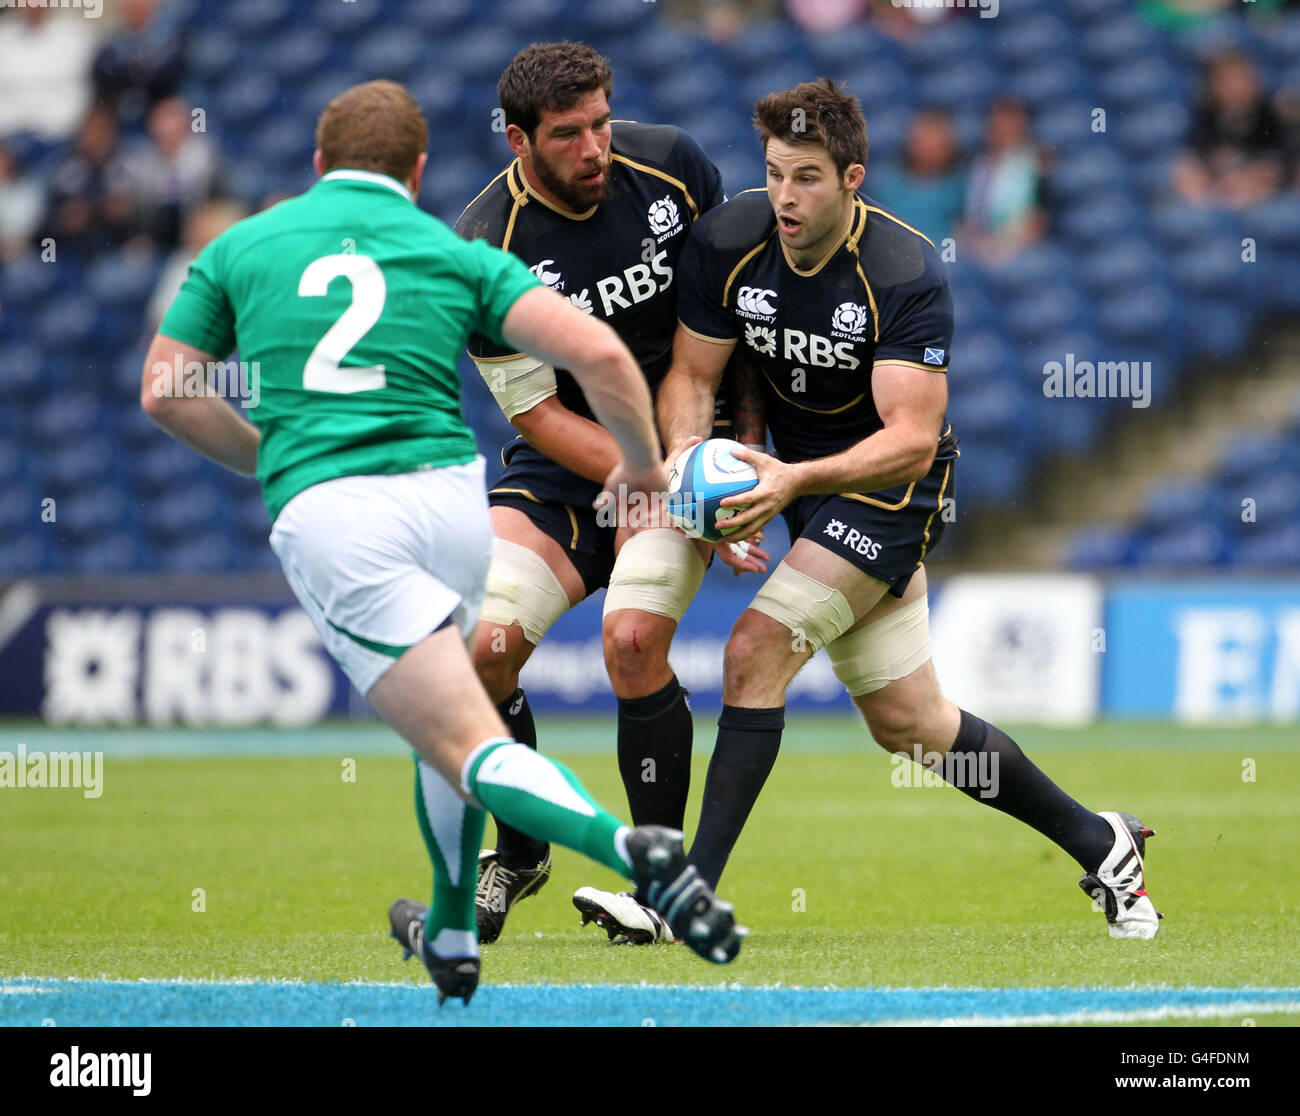 Scotland V Australia World Rugby: Jim Cronin Stock Photos & Jim Cronin Stock Images